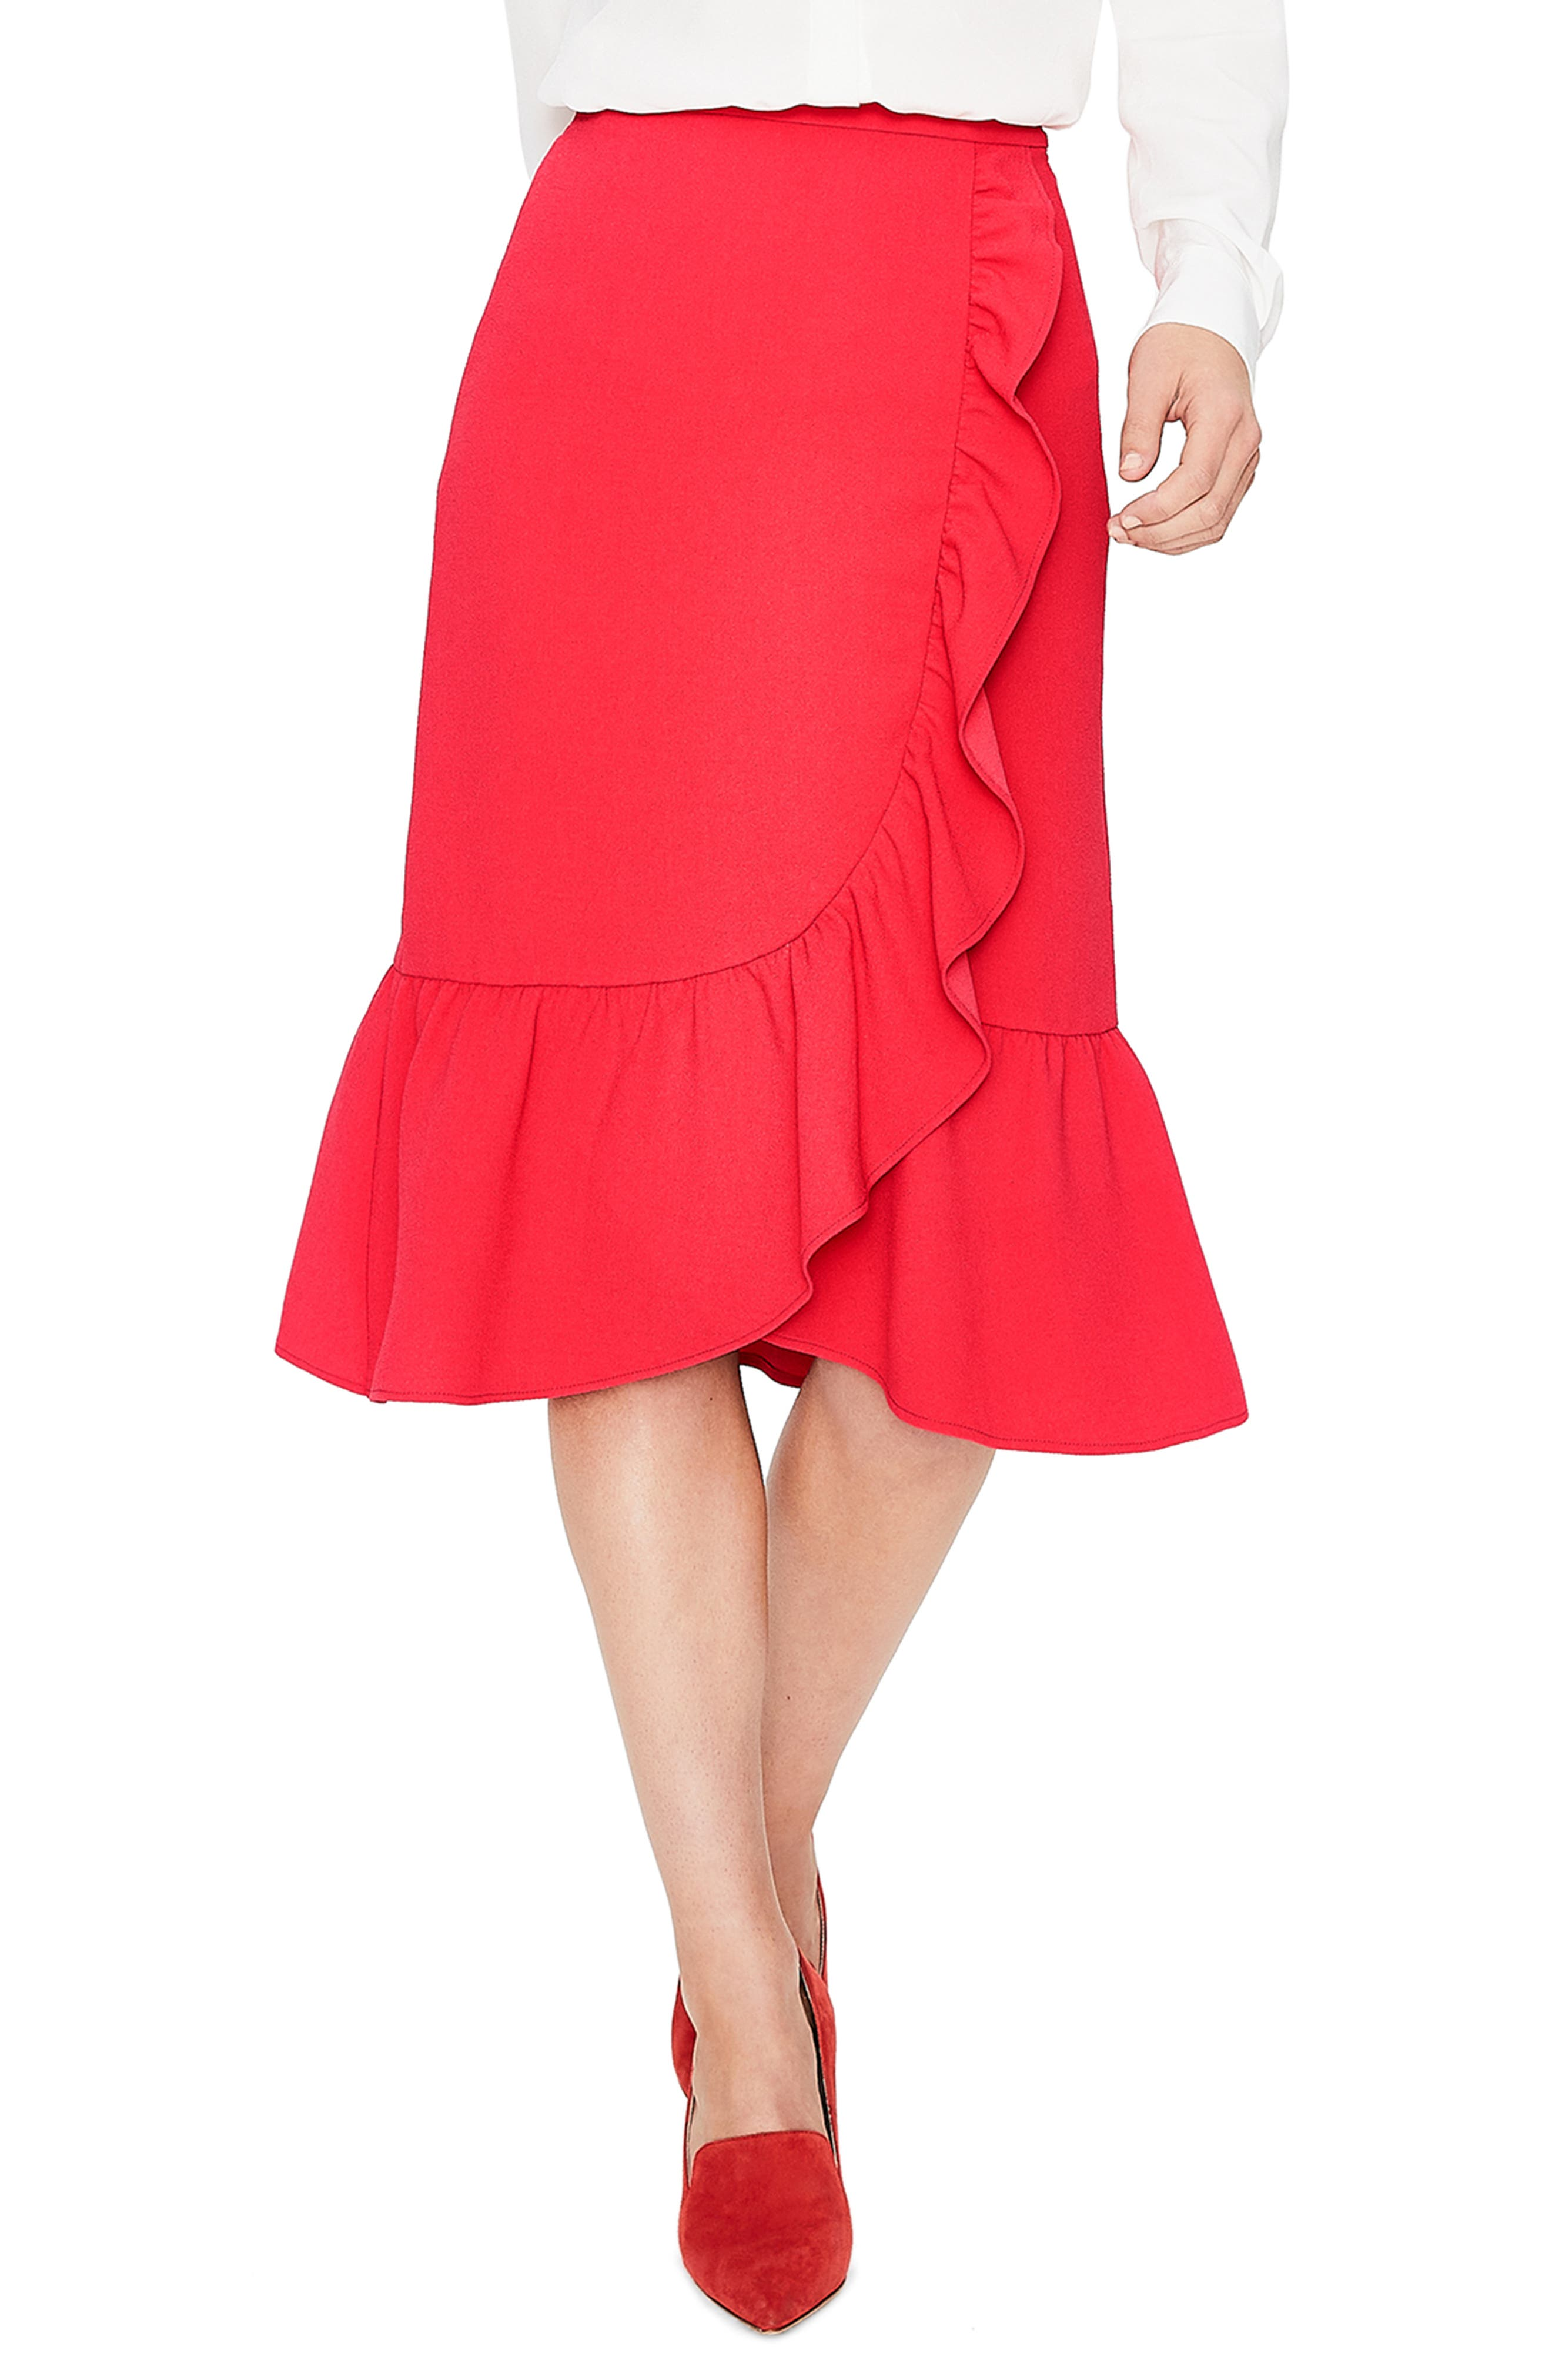 Boden Ella Frill Wrap Skirt